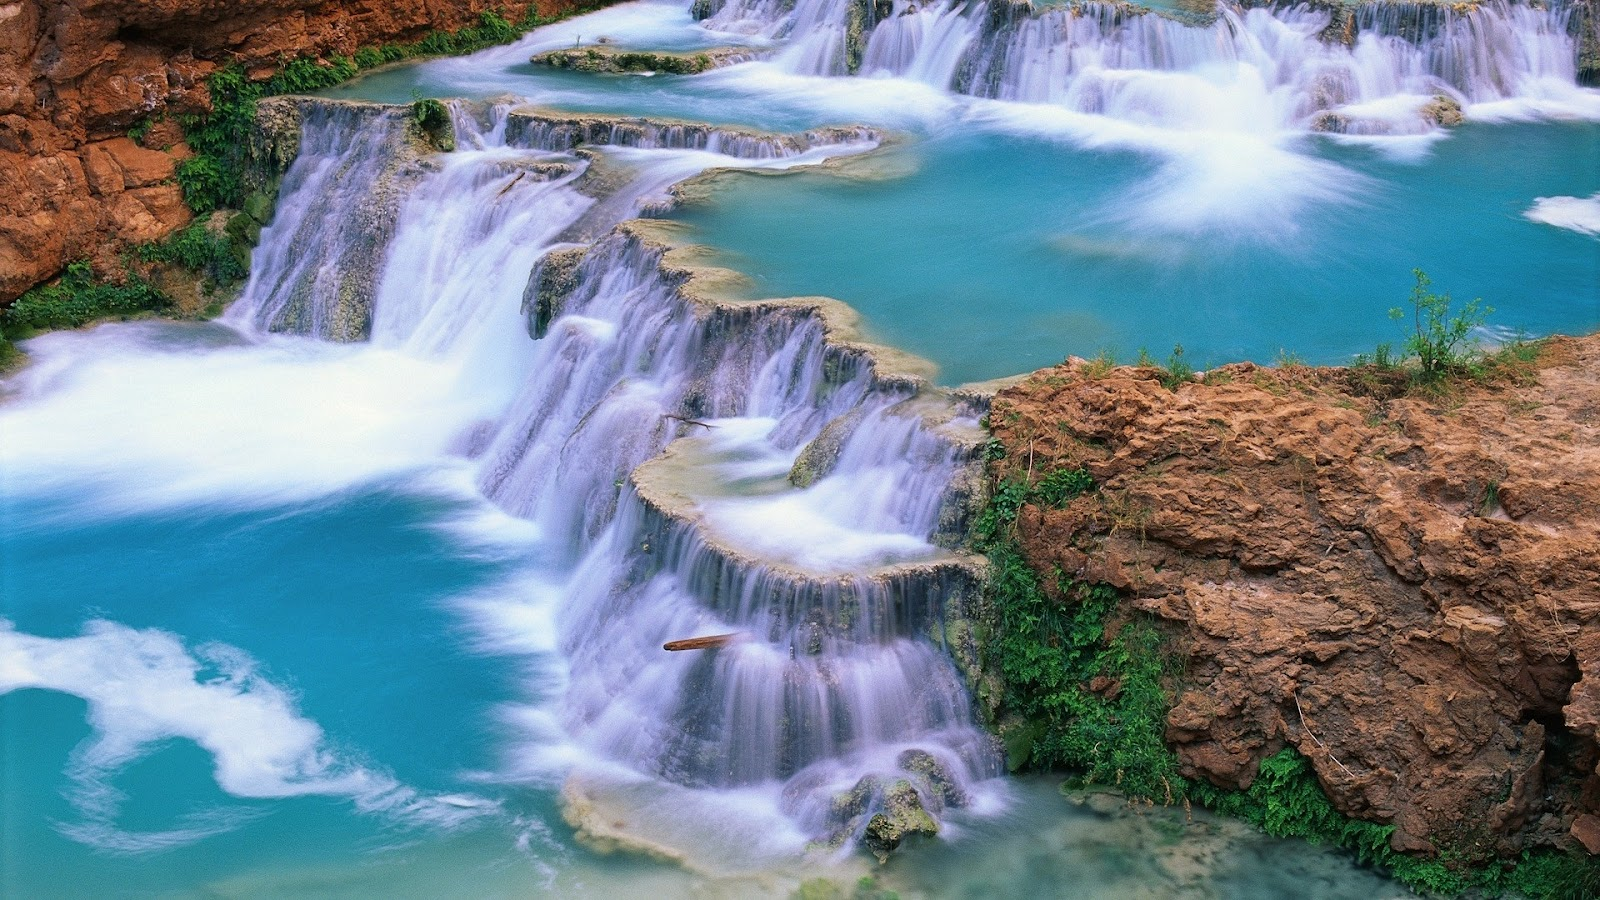 http://3.bp.blogspot.com/-R3Adg6PDWiU/UQFNX-85XKI/AAAAAAAAQMM/3-I4OUwJBs4/s1600/Waterfall+HD+Wallpapers+(6).jpg